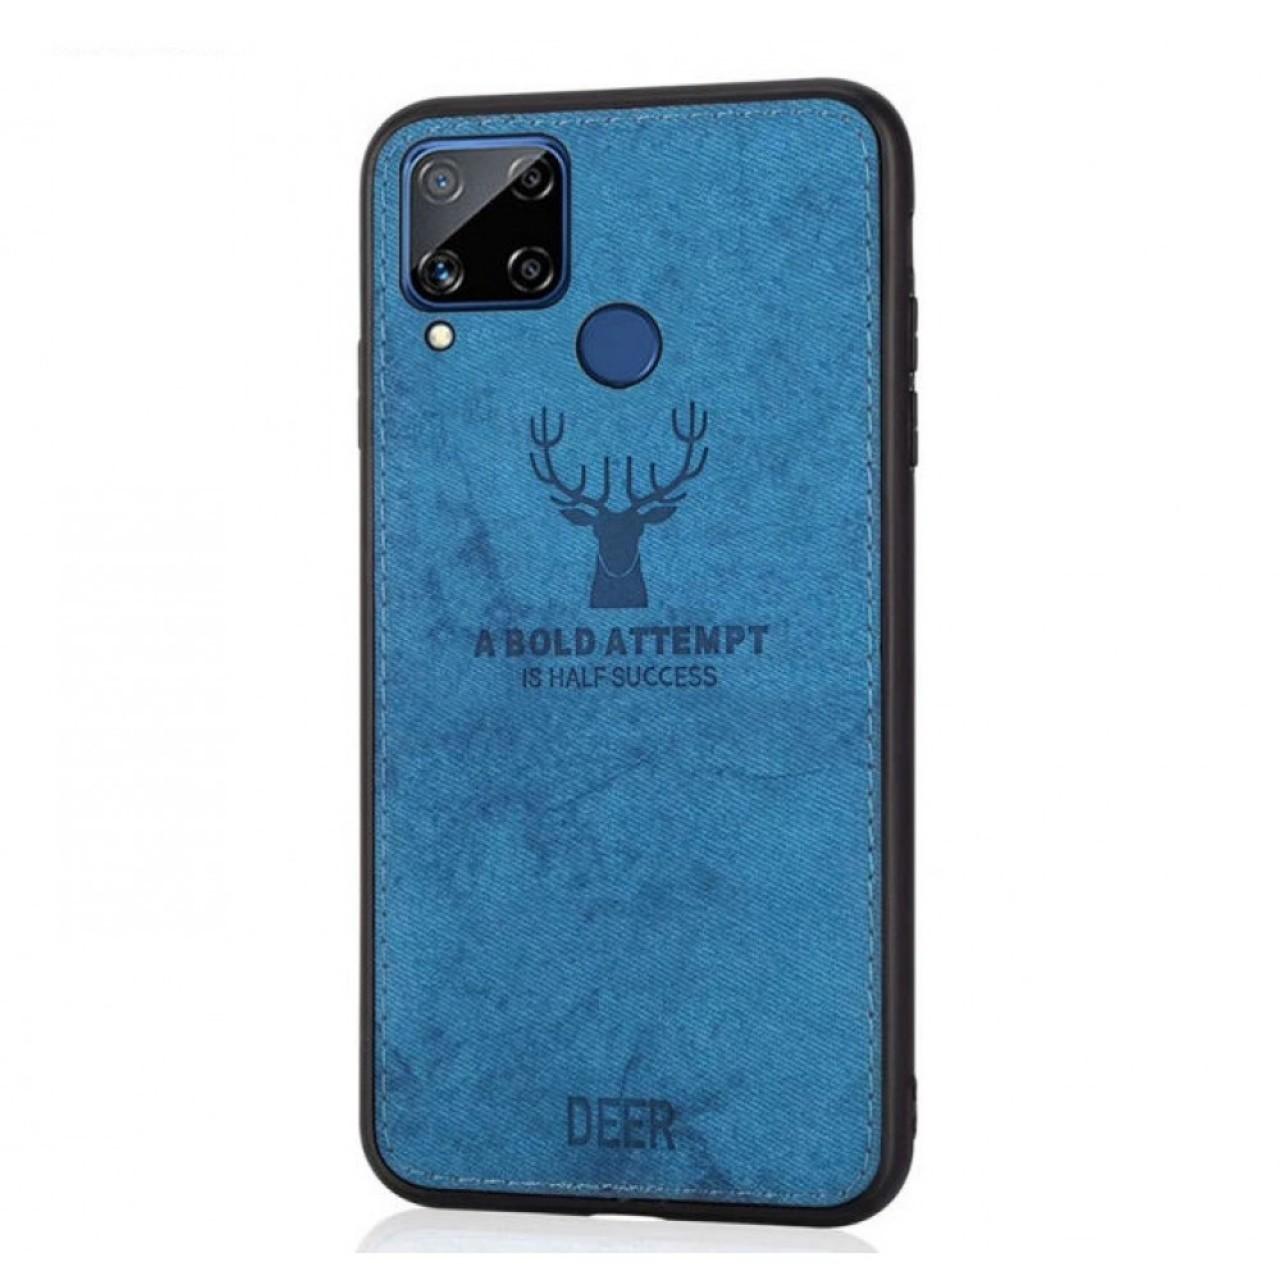 DEER CLOTH BACK CASE FOR HUAWEI P40 LITE - BLUE